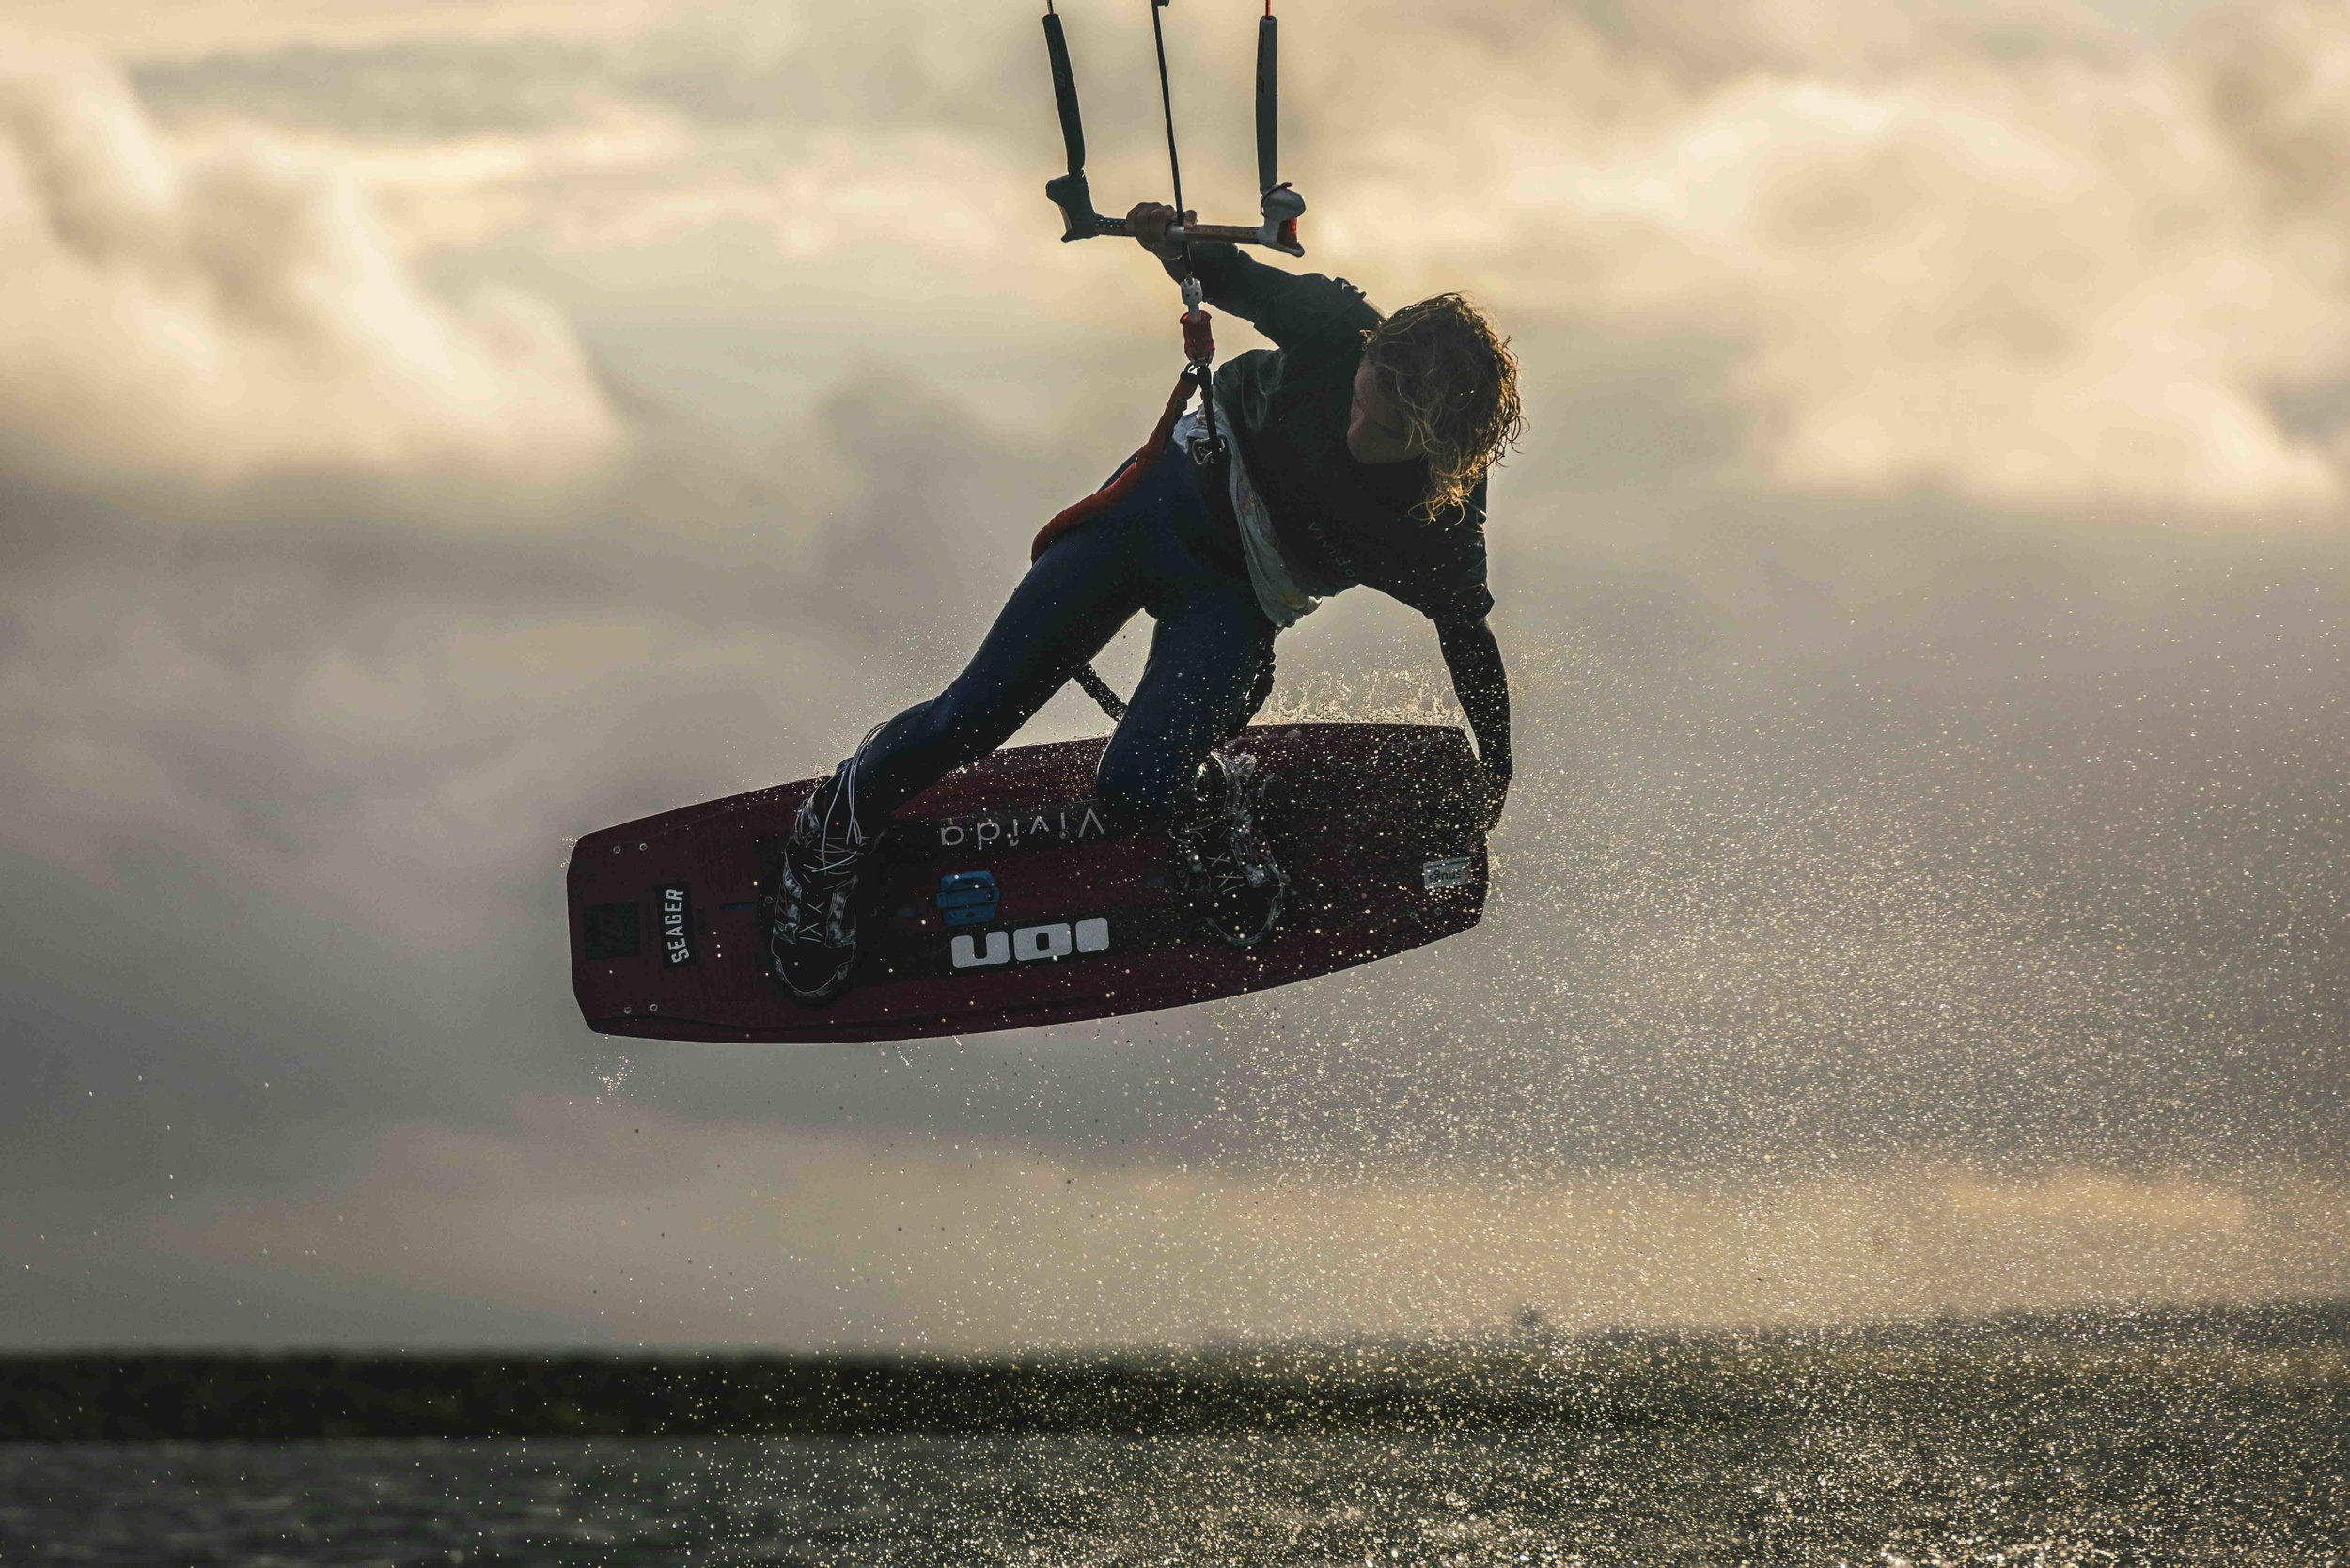 Tom Seager - UNITED KINGDOMPro Kiteboarding - Wakeboarding - Surf - Videography - Travel